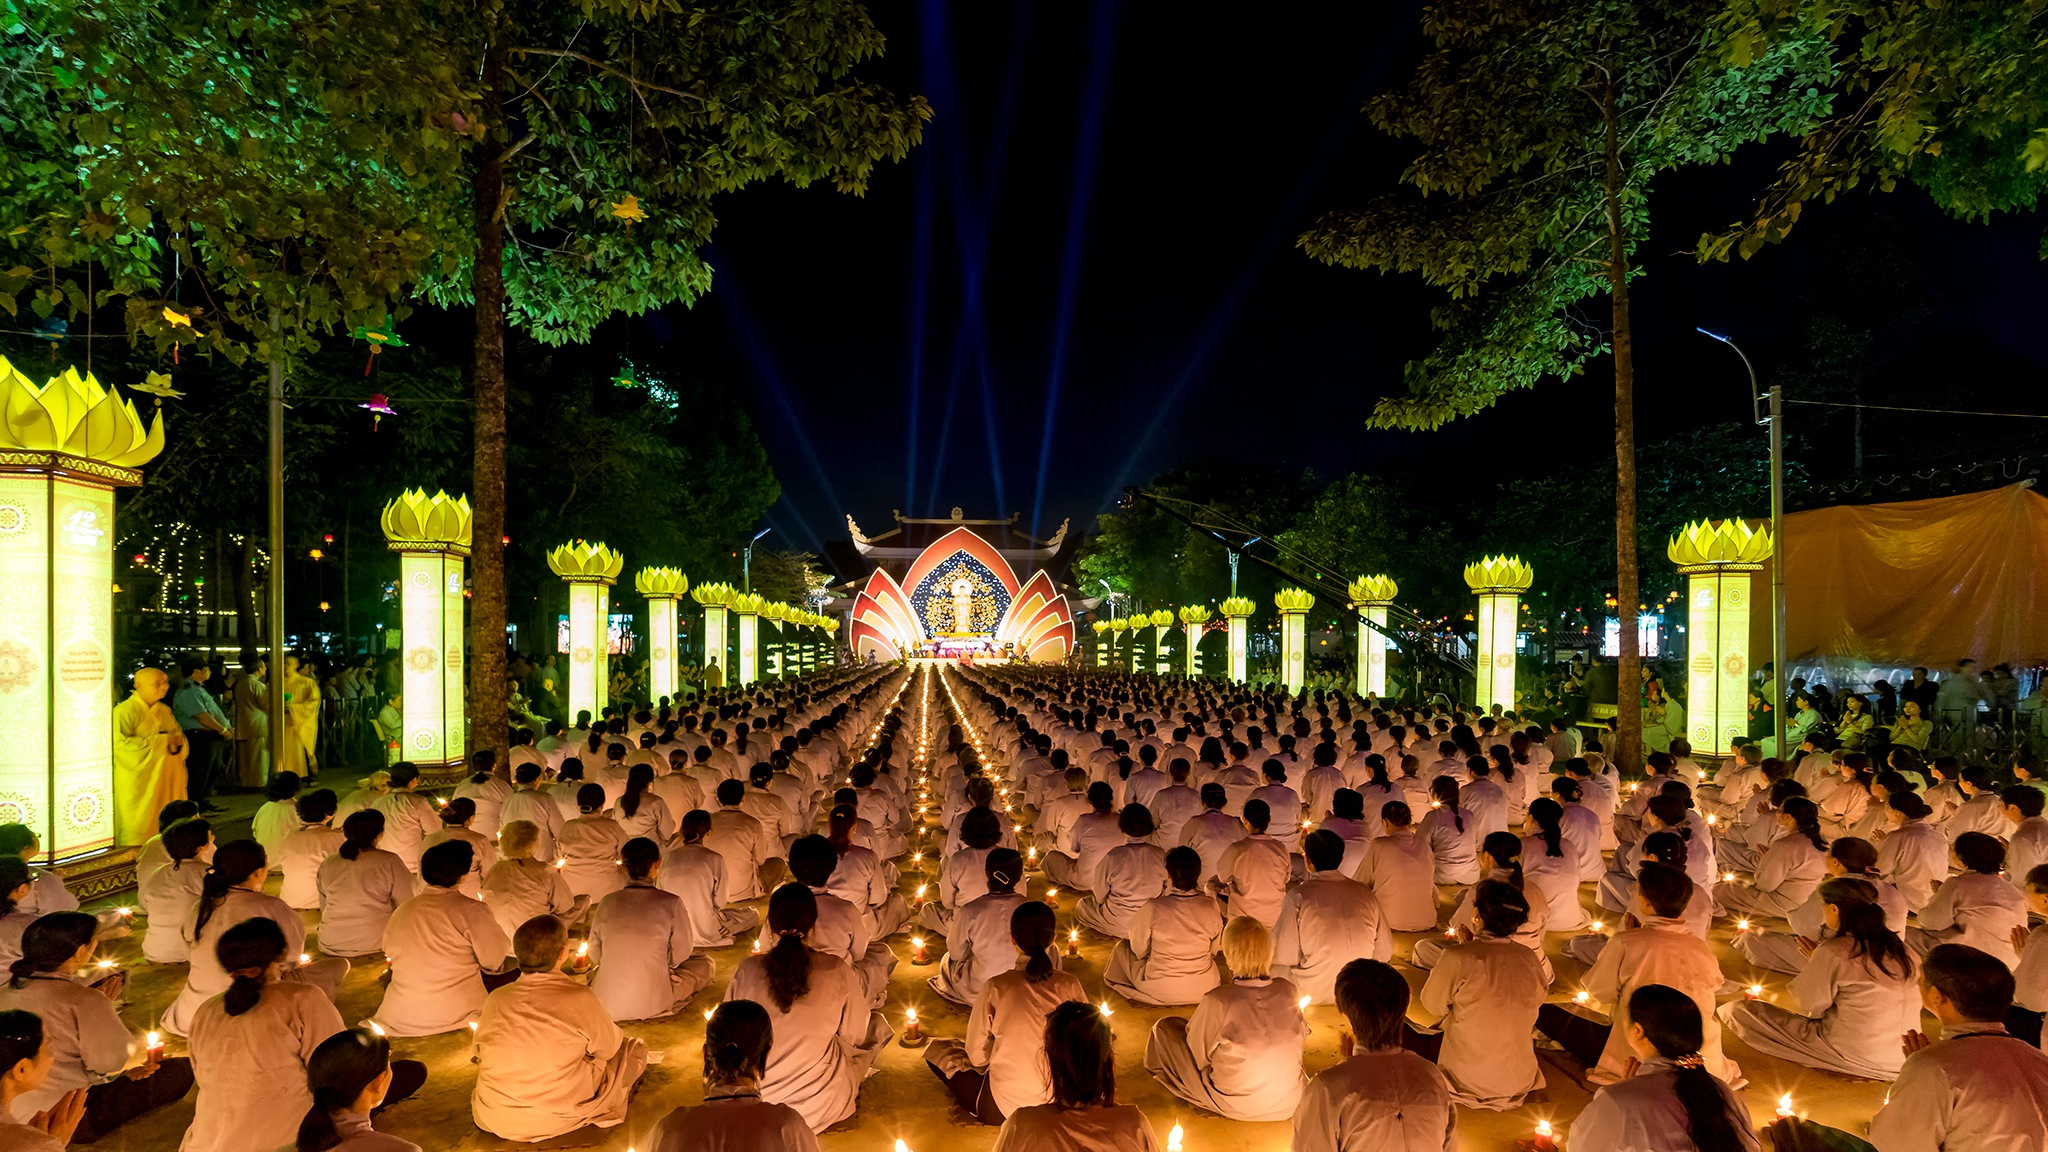 Hoang Phap pagoda festival 2016, HoChiMinh Cty, VietNam by phonghoa